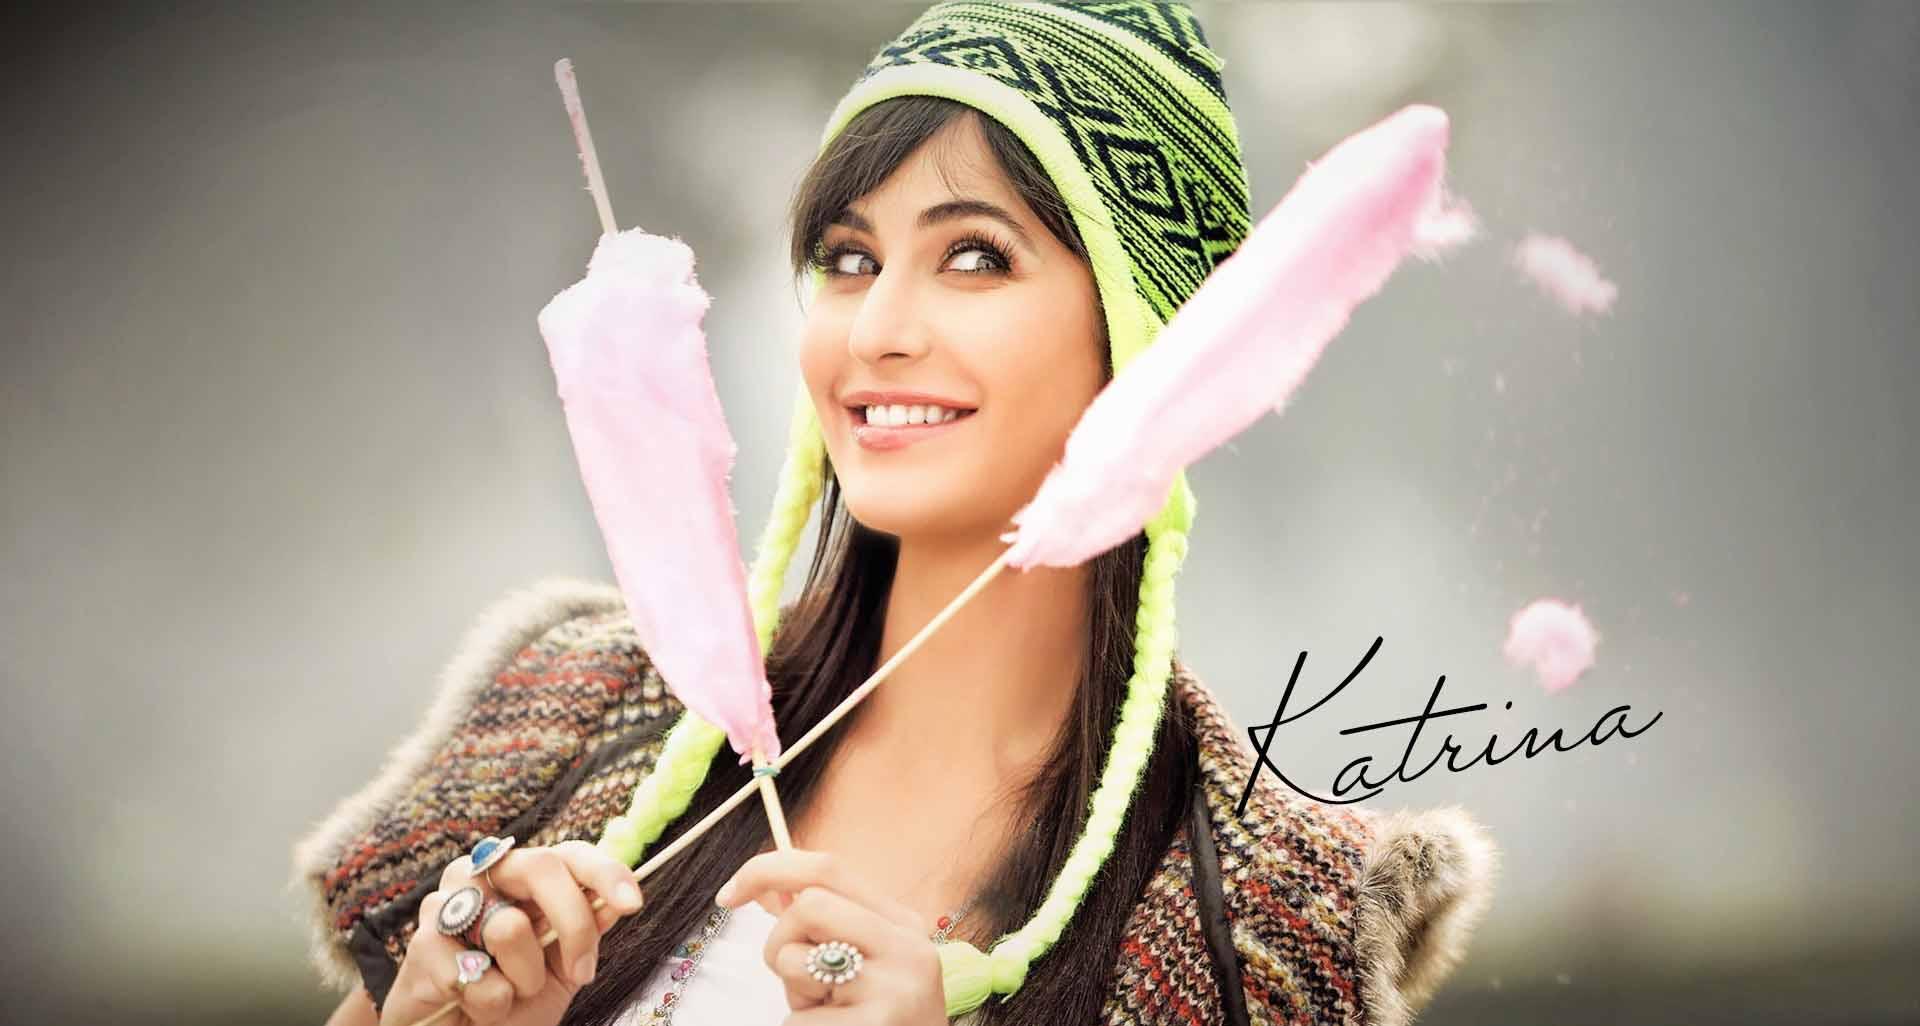 Katrina Kaif Gorgeous HD Wallpaper 1920x1026